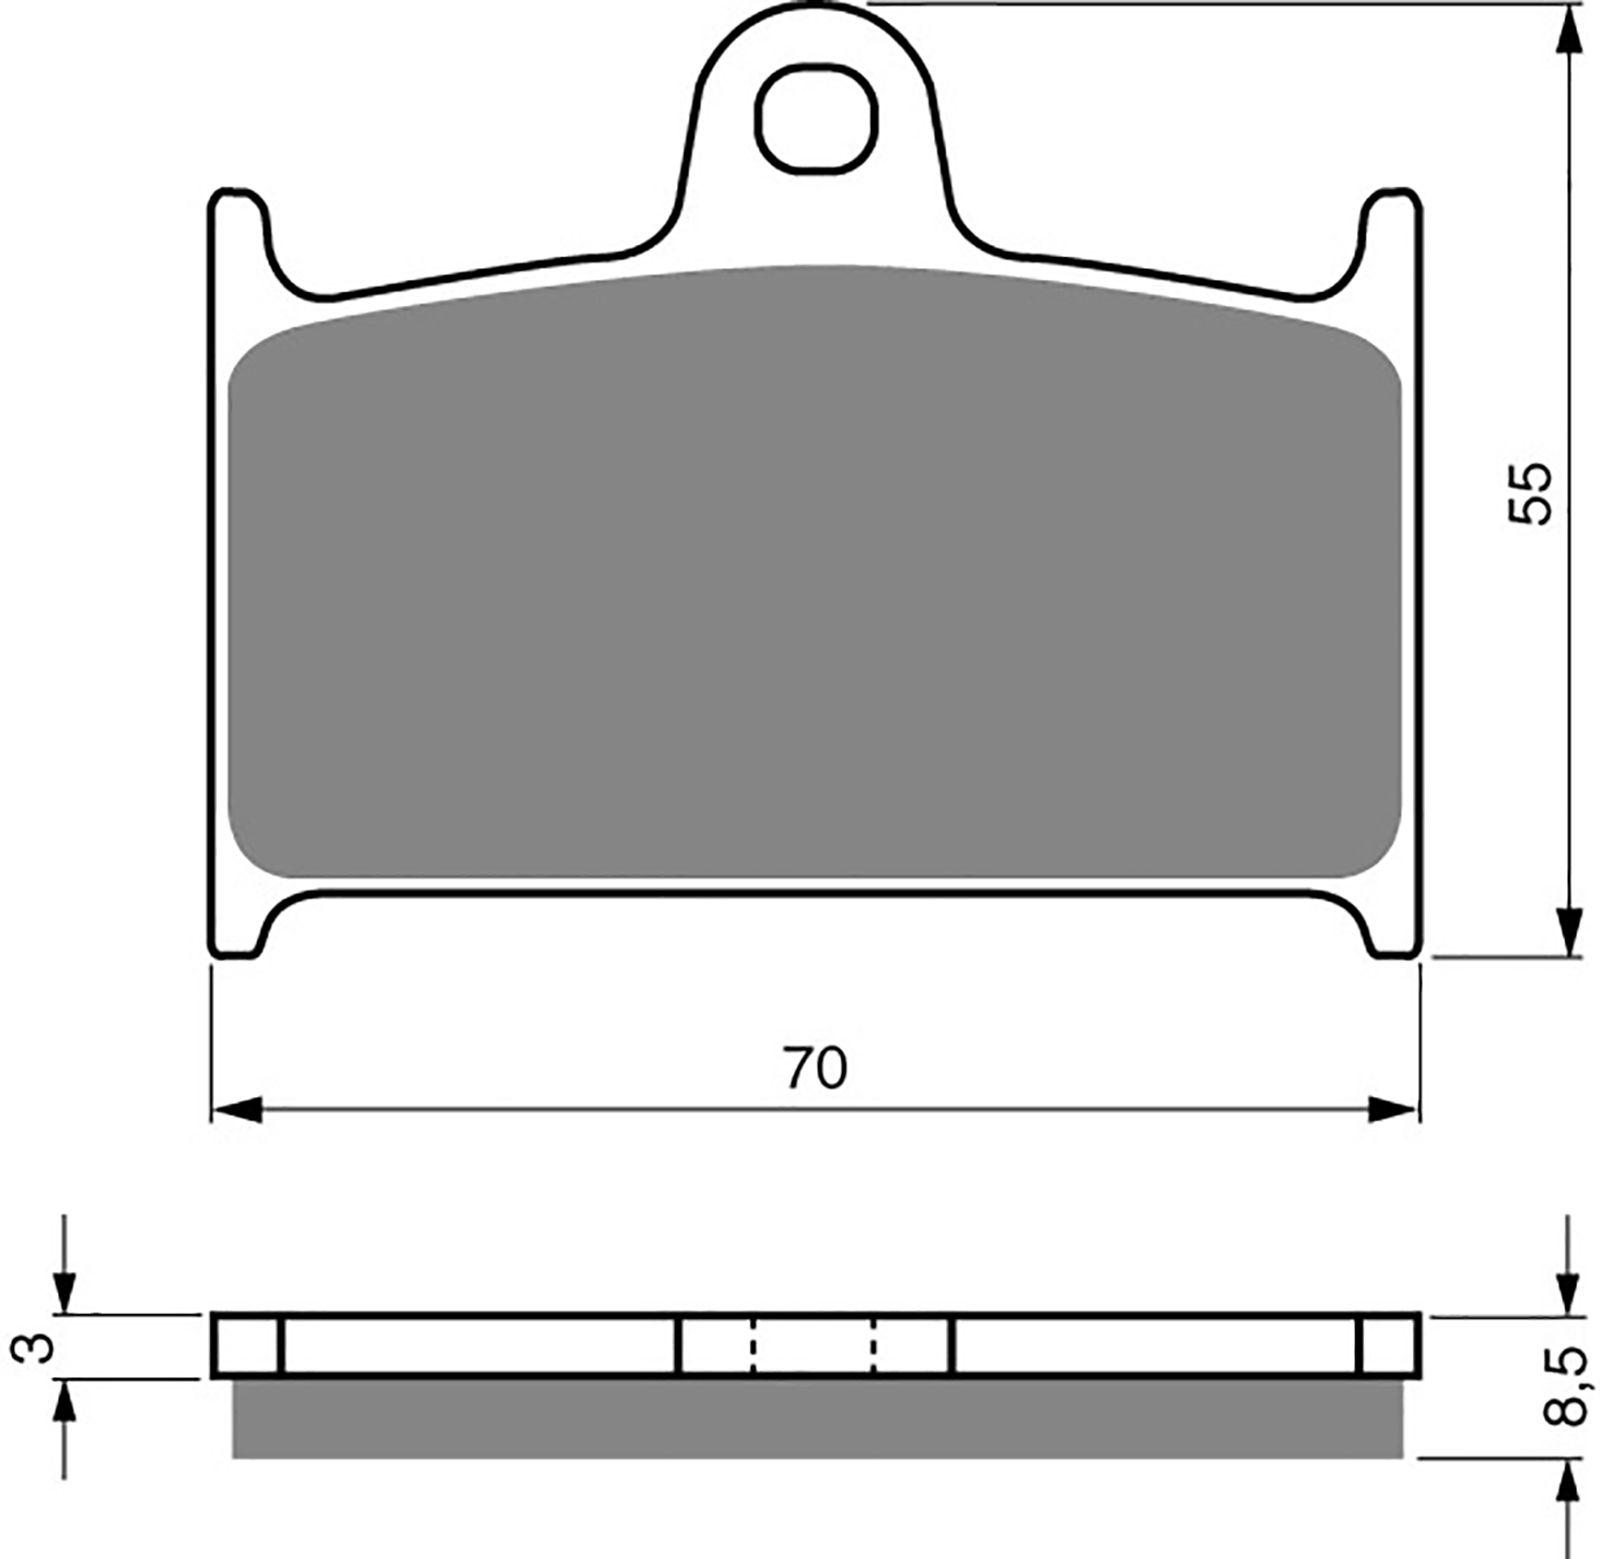 Goldfren S33 Brake Pads - 700017GS image